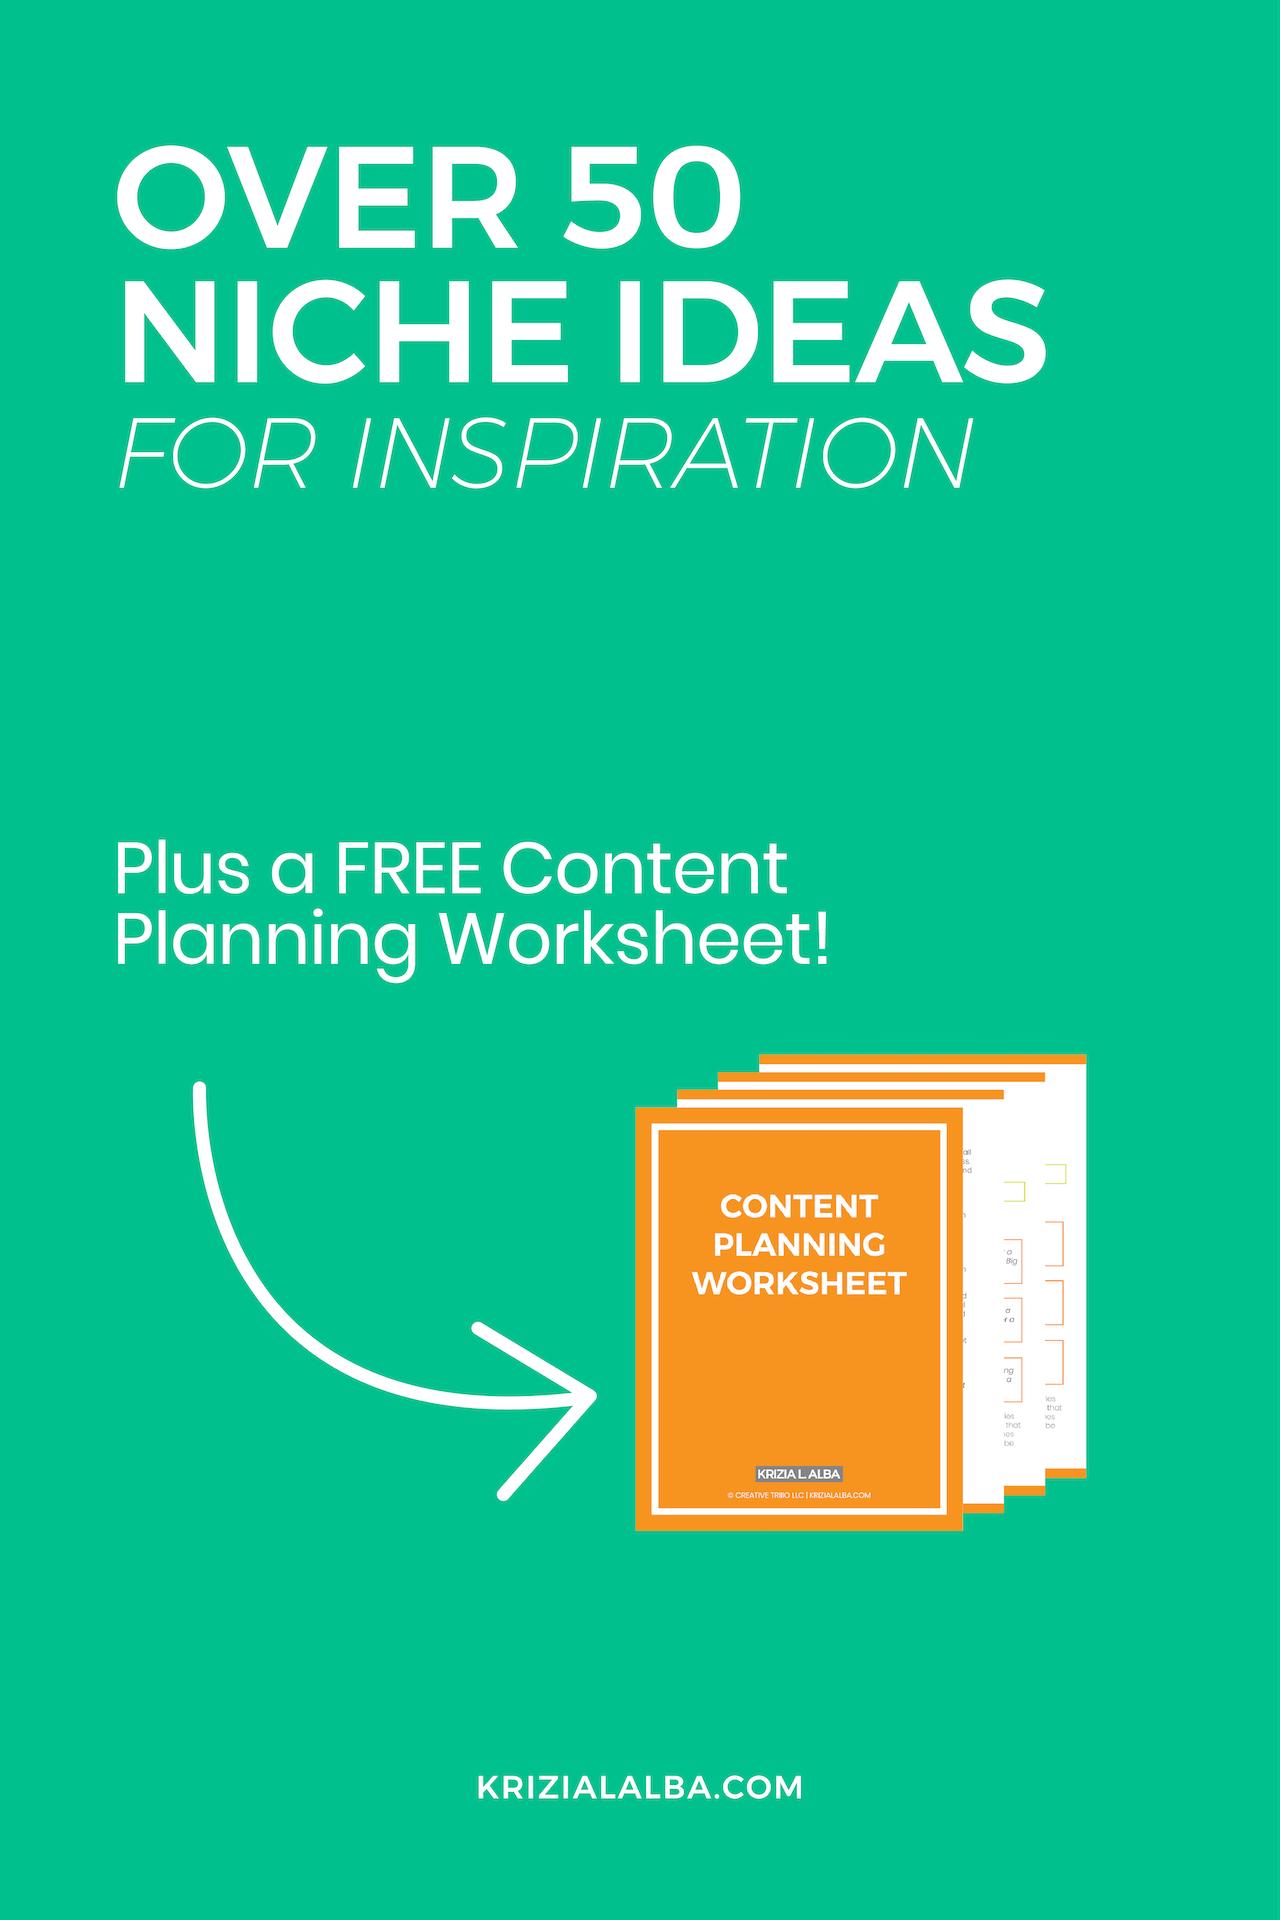 Niche Ideas for Inspiration